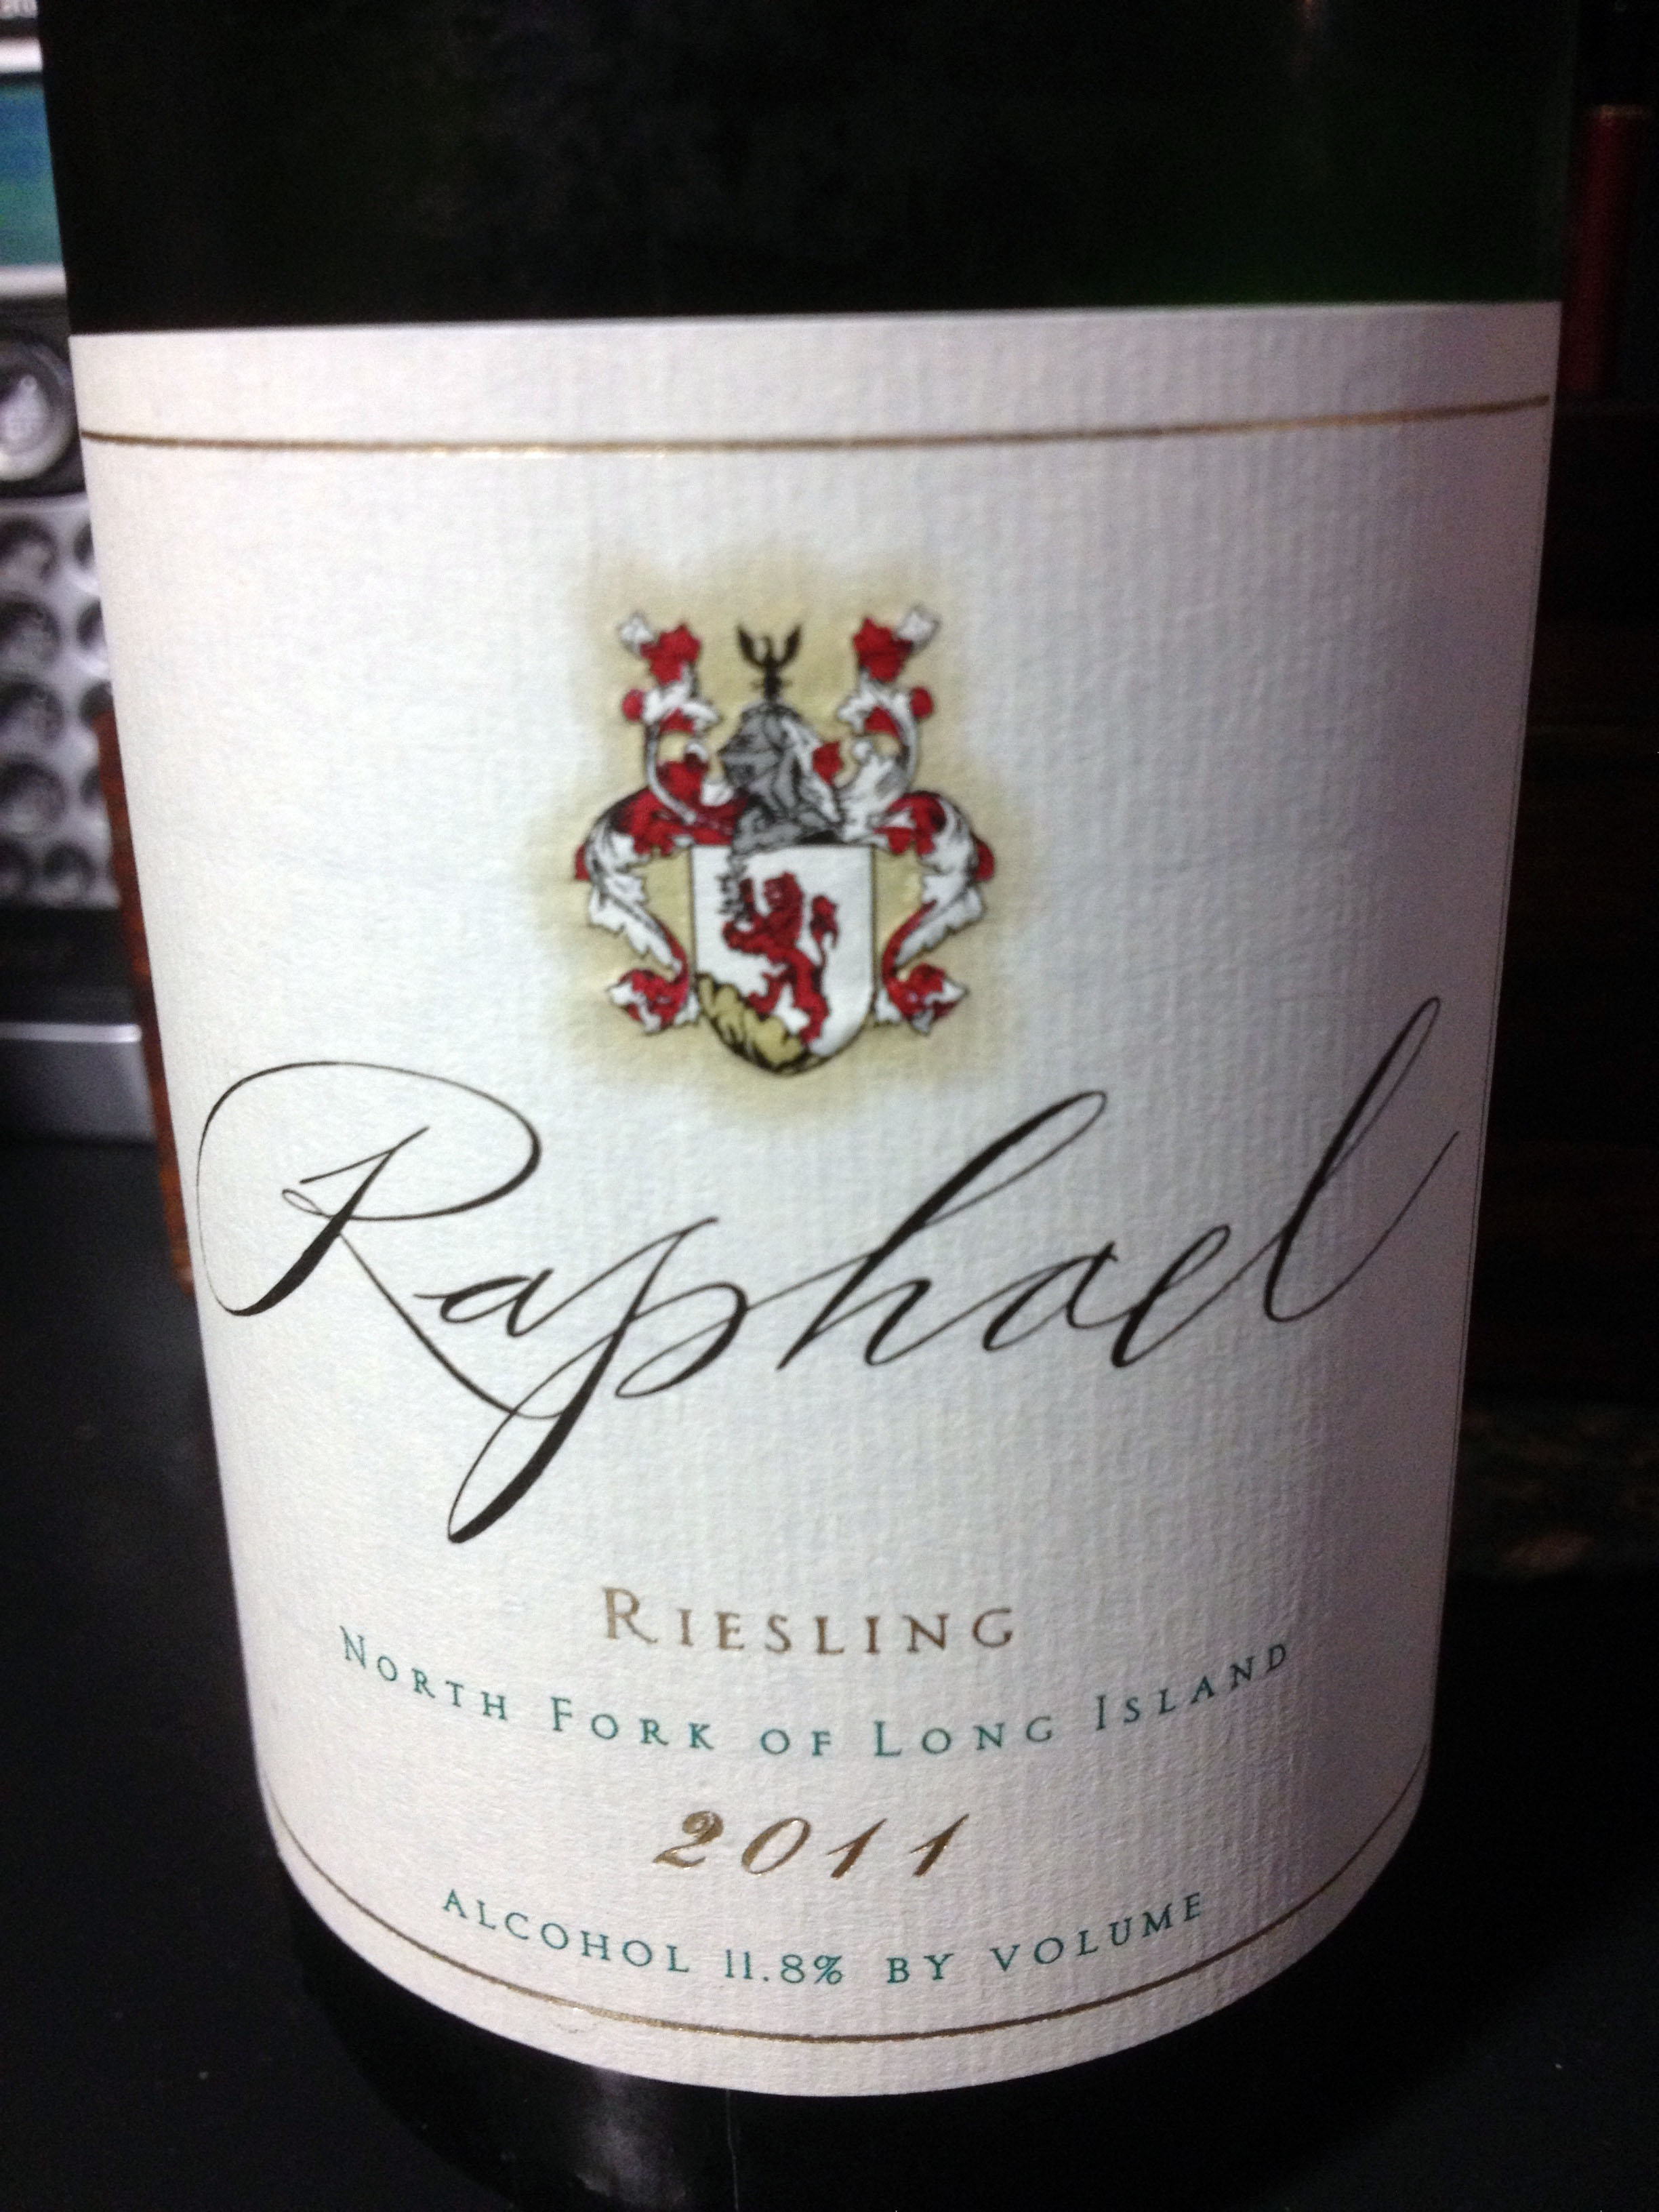 raphael-2011-riesling